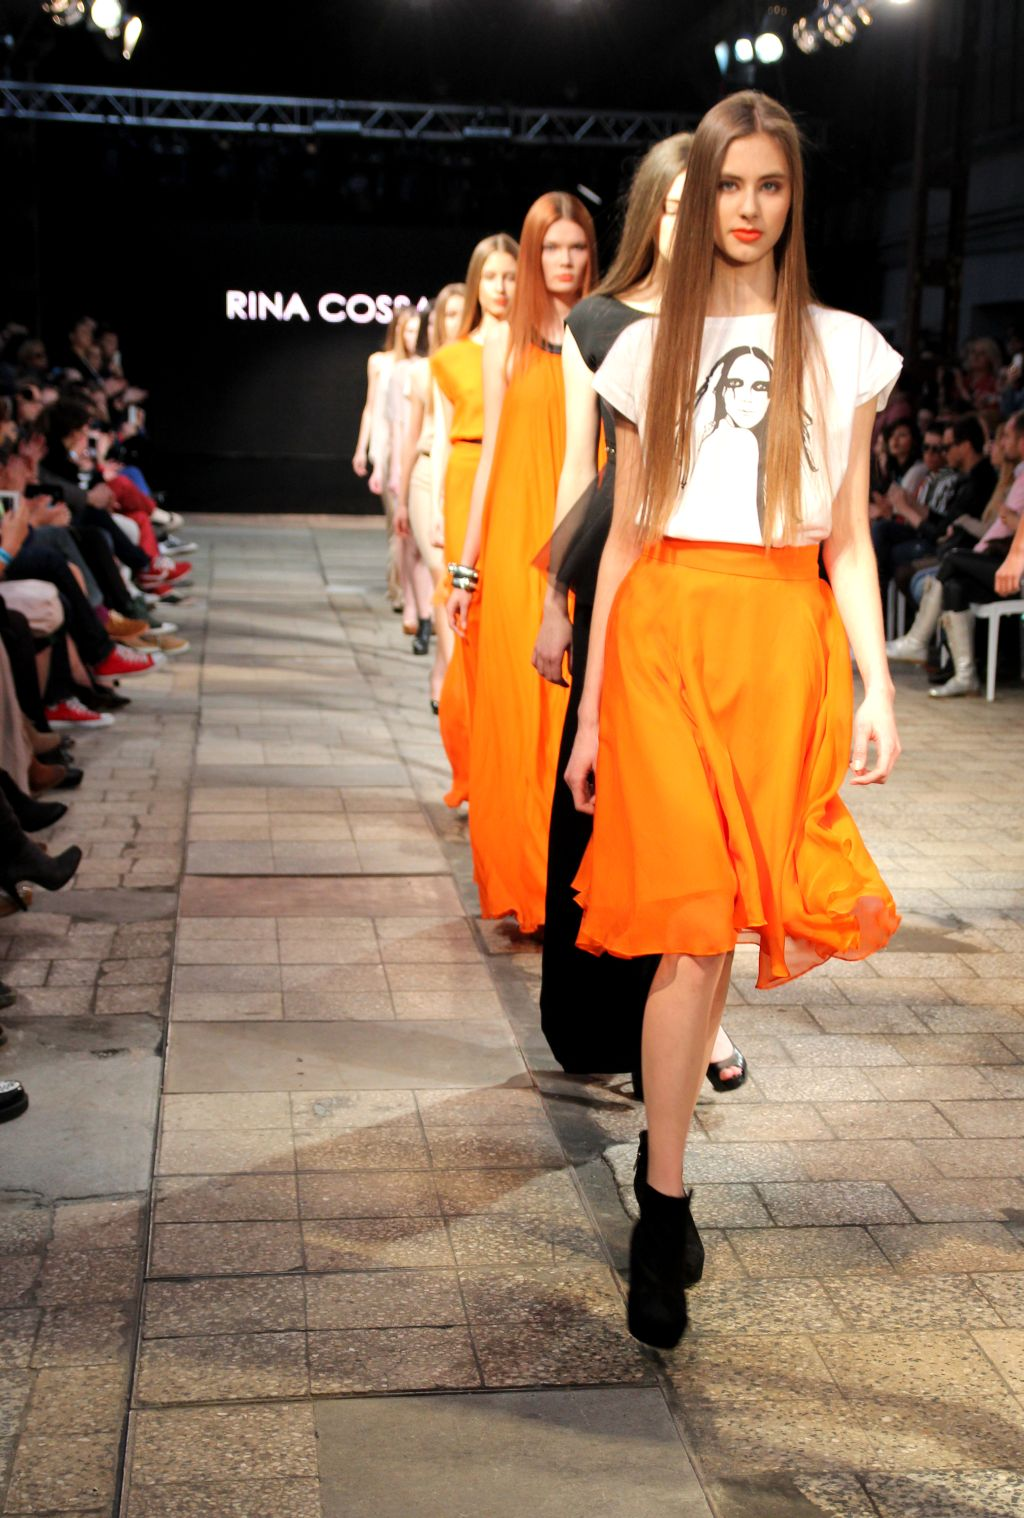 WFW RINA COSSACK 14